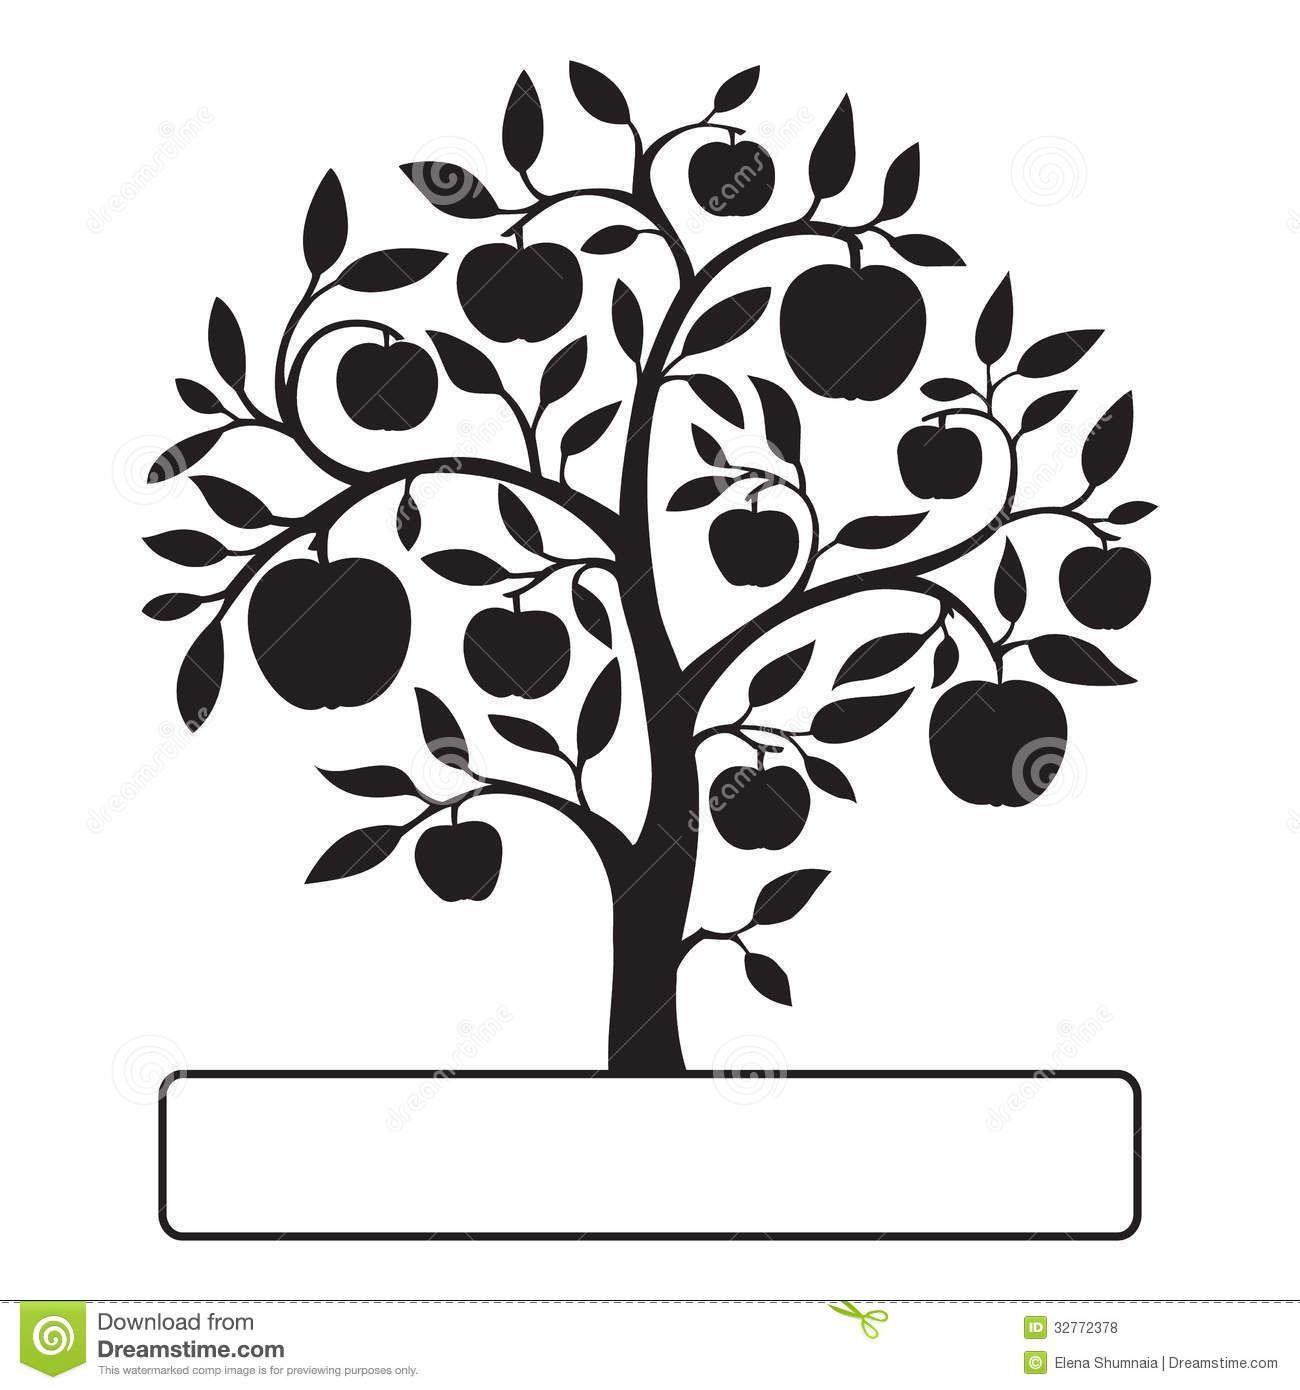 Images For Black And White Apple Trees Clipart Apple Tree Lemon Tree Tree Logos